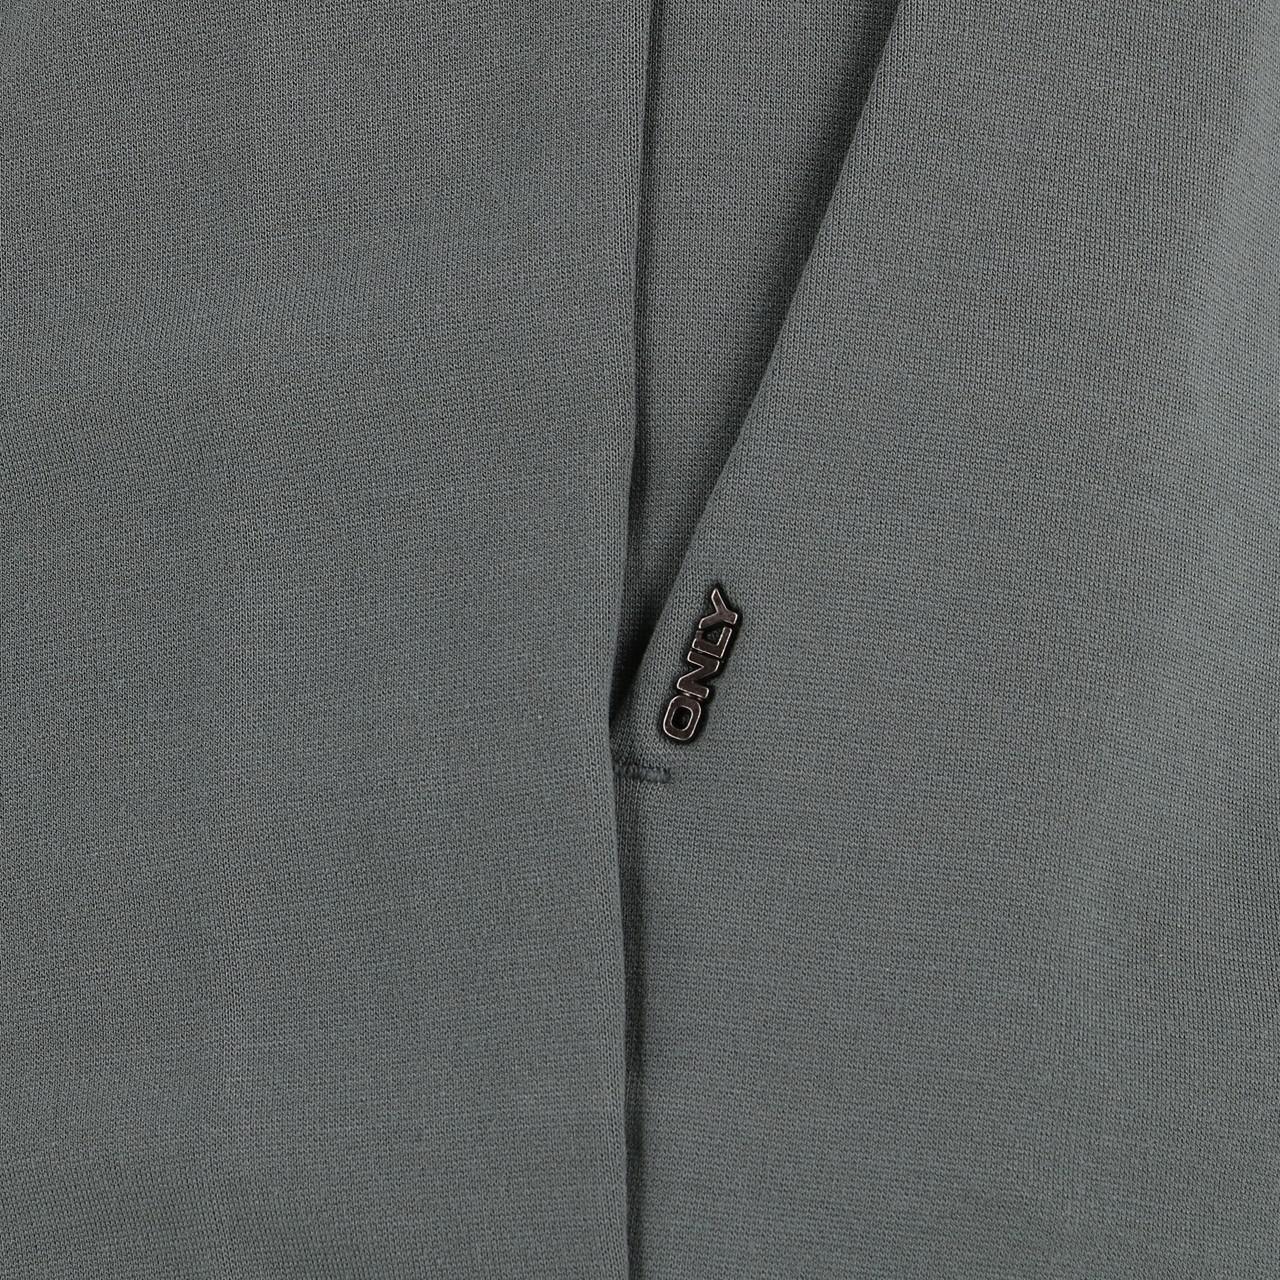 Bermuda-Shorts-Only-Poptrash-Lt-Khaki-Shorts-Green-18701-New thumbnail 3